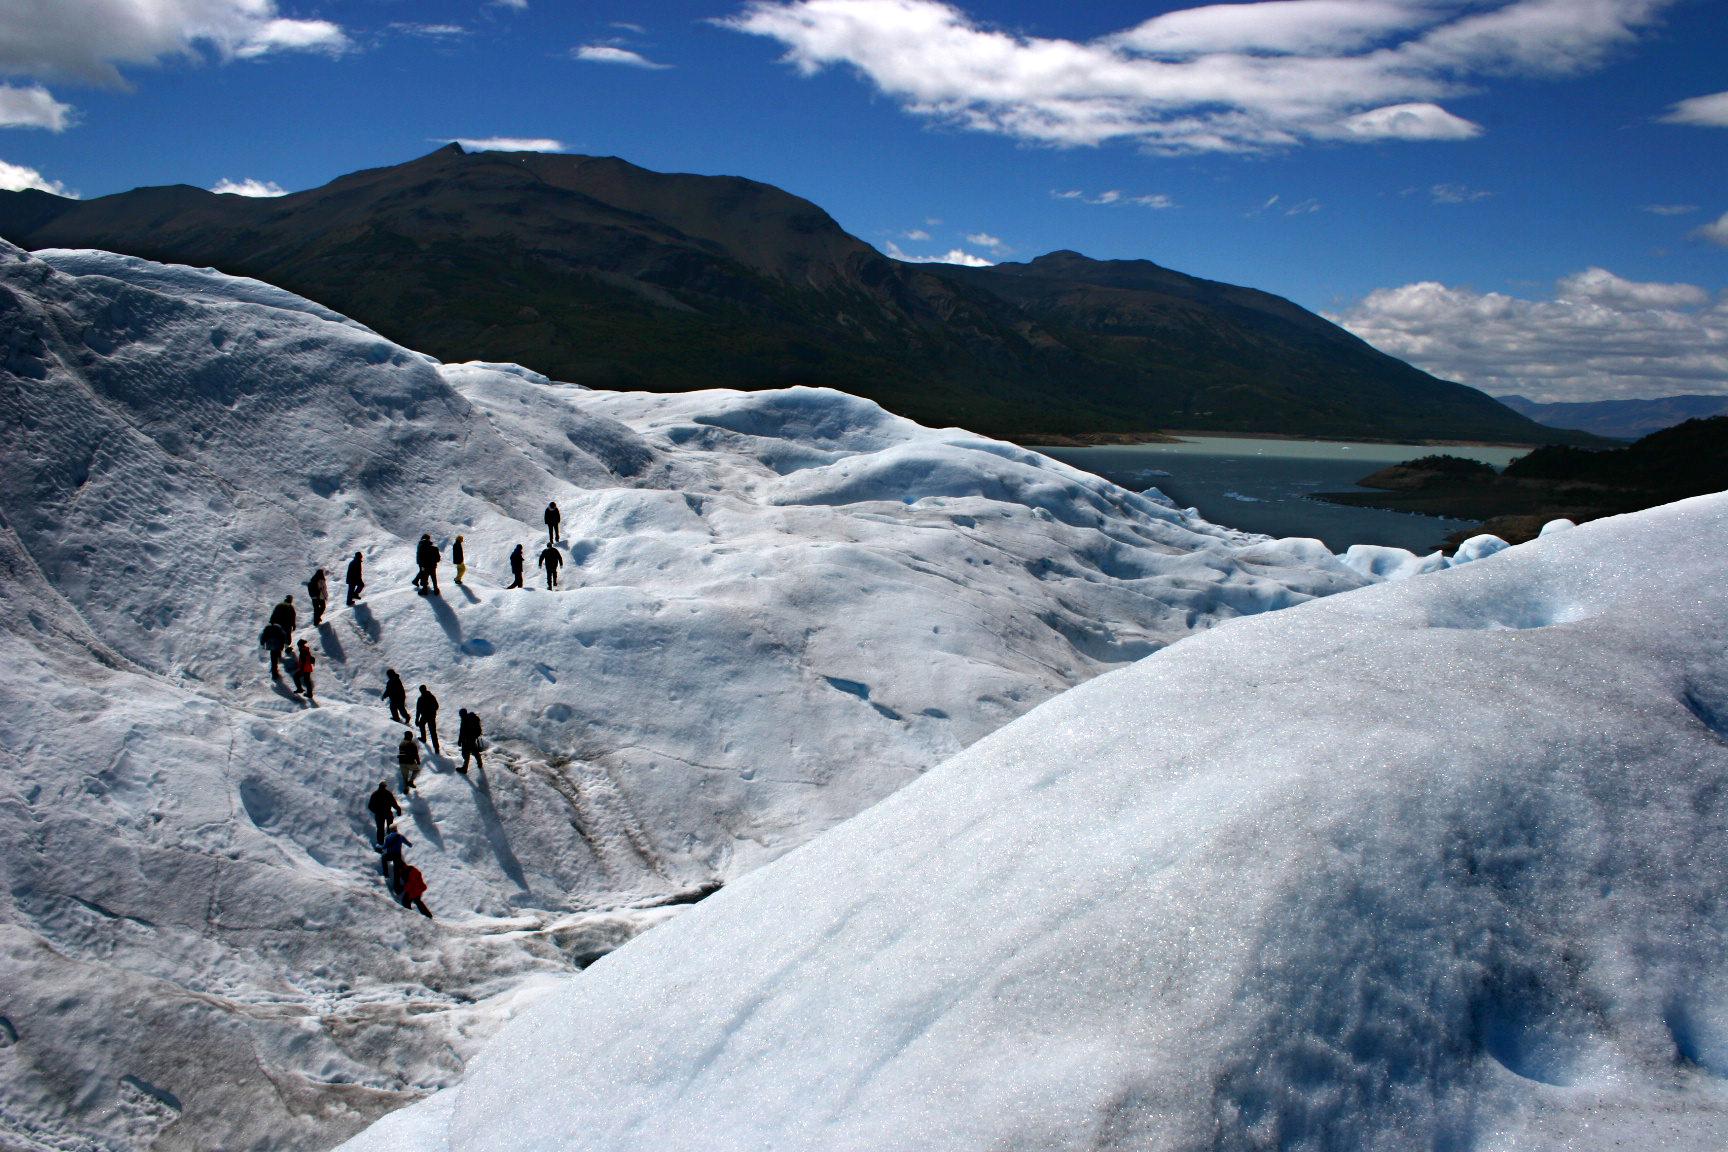 Seres humanos fazendo as vezes de formigas no fantástico mundo azul e branco do Perito Moreno. Crédito: